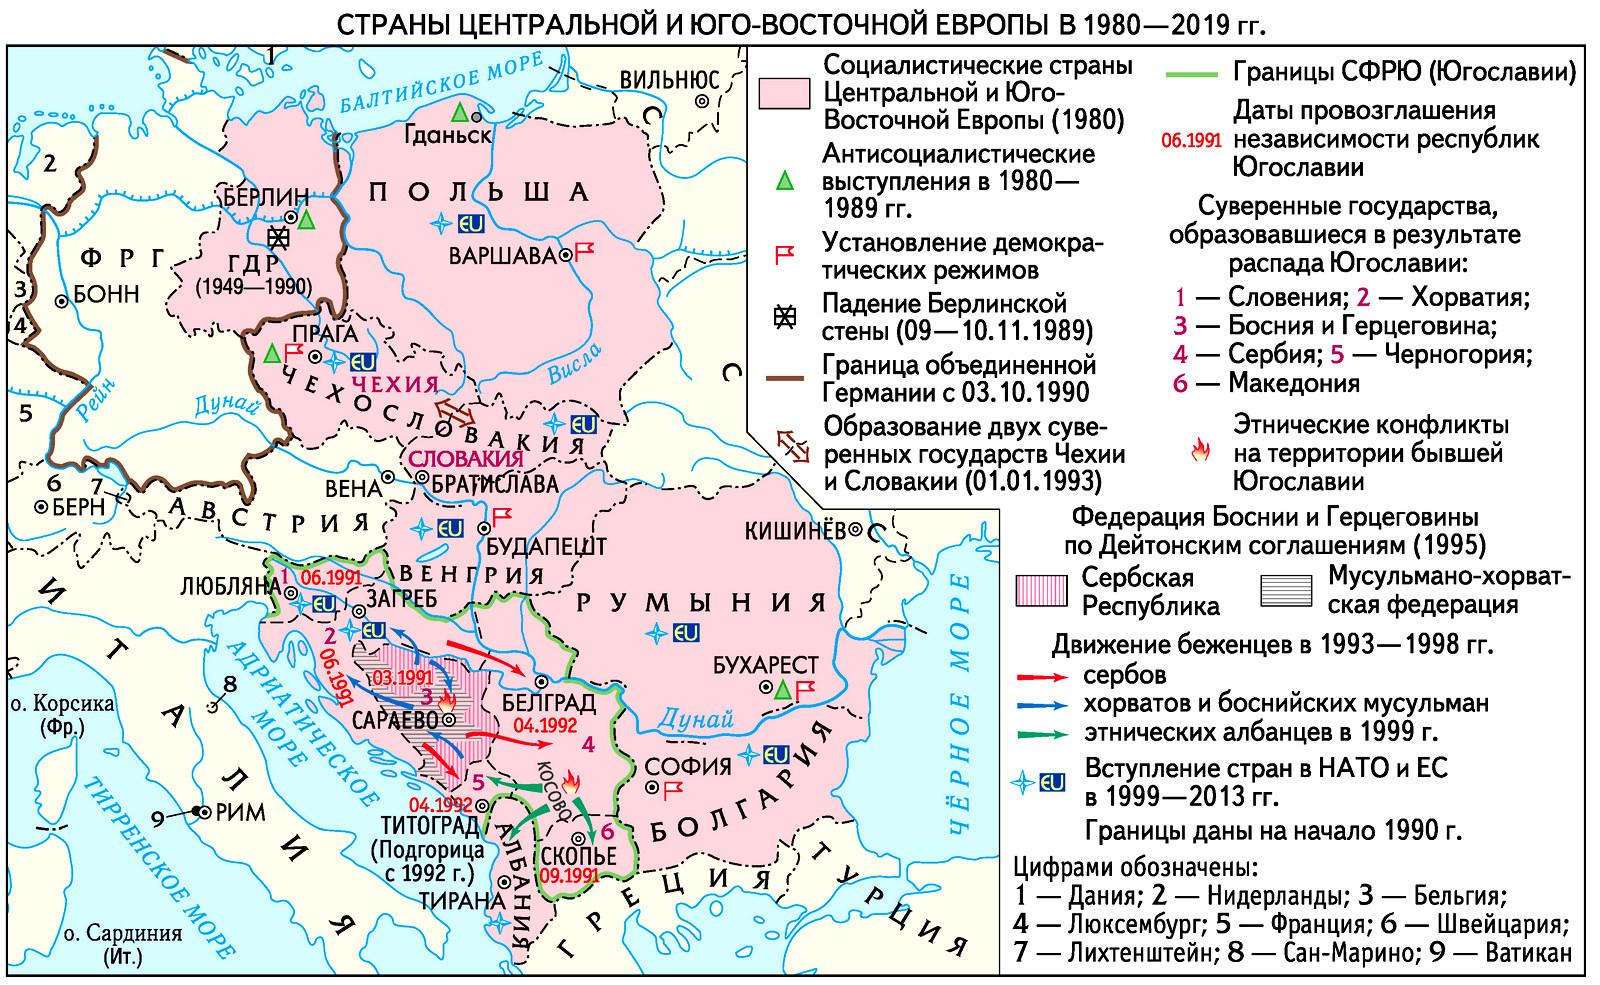 Восточная Европа во второй половине XX века